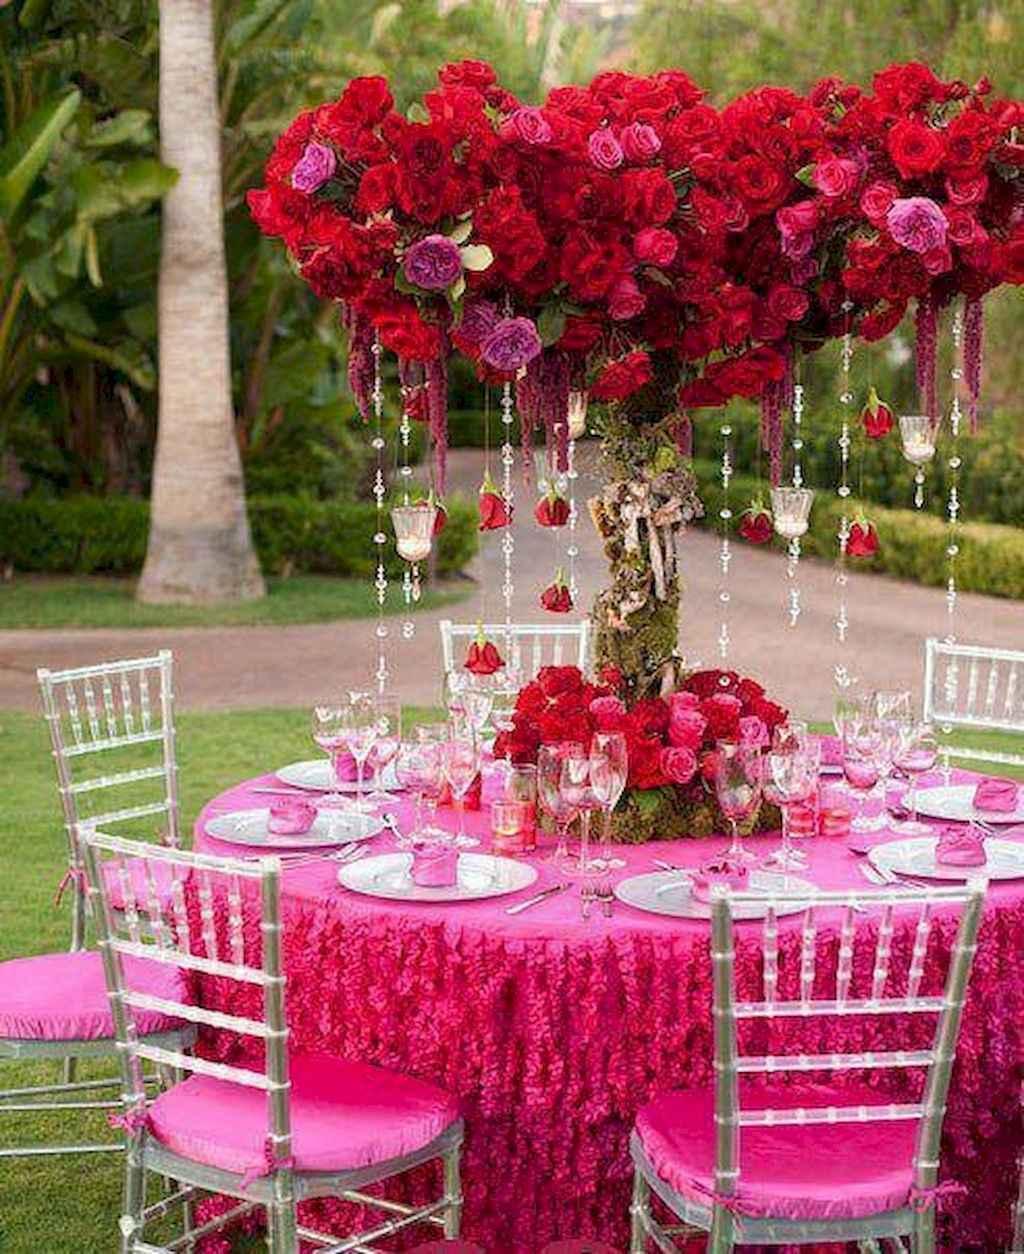 66 Romantic Valentines Table Settings Decor Ideas (54)